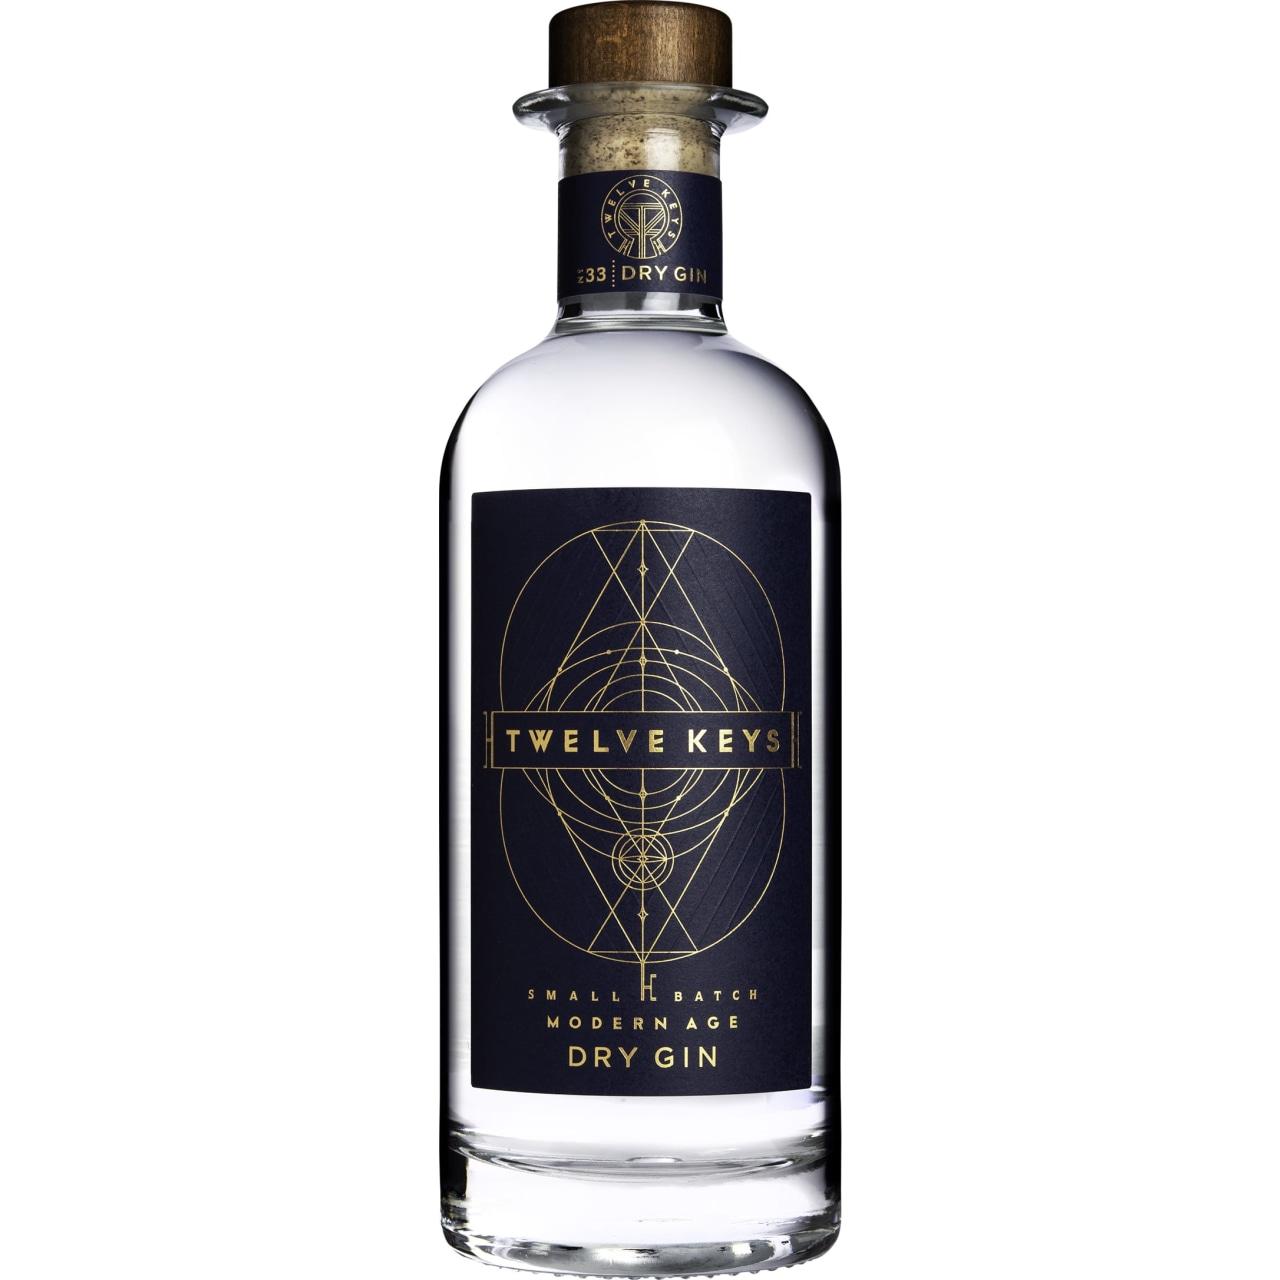 Twelve Keys Dry Gin